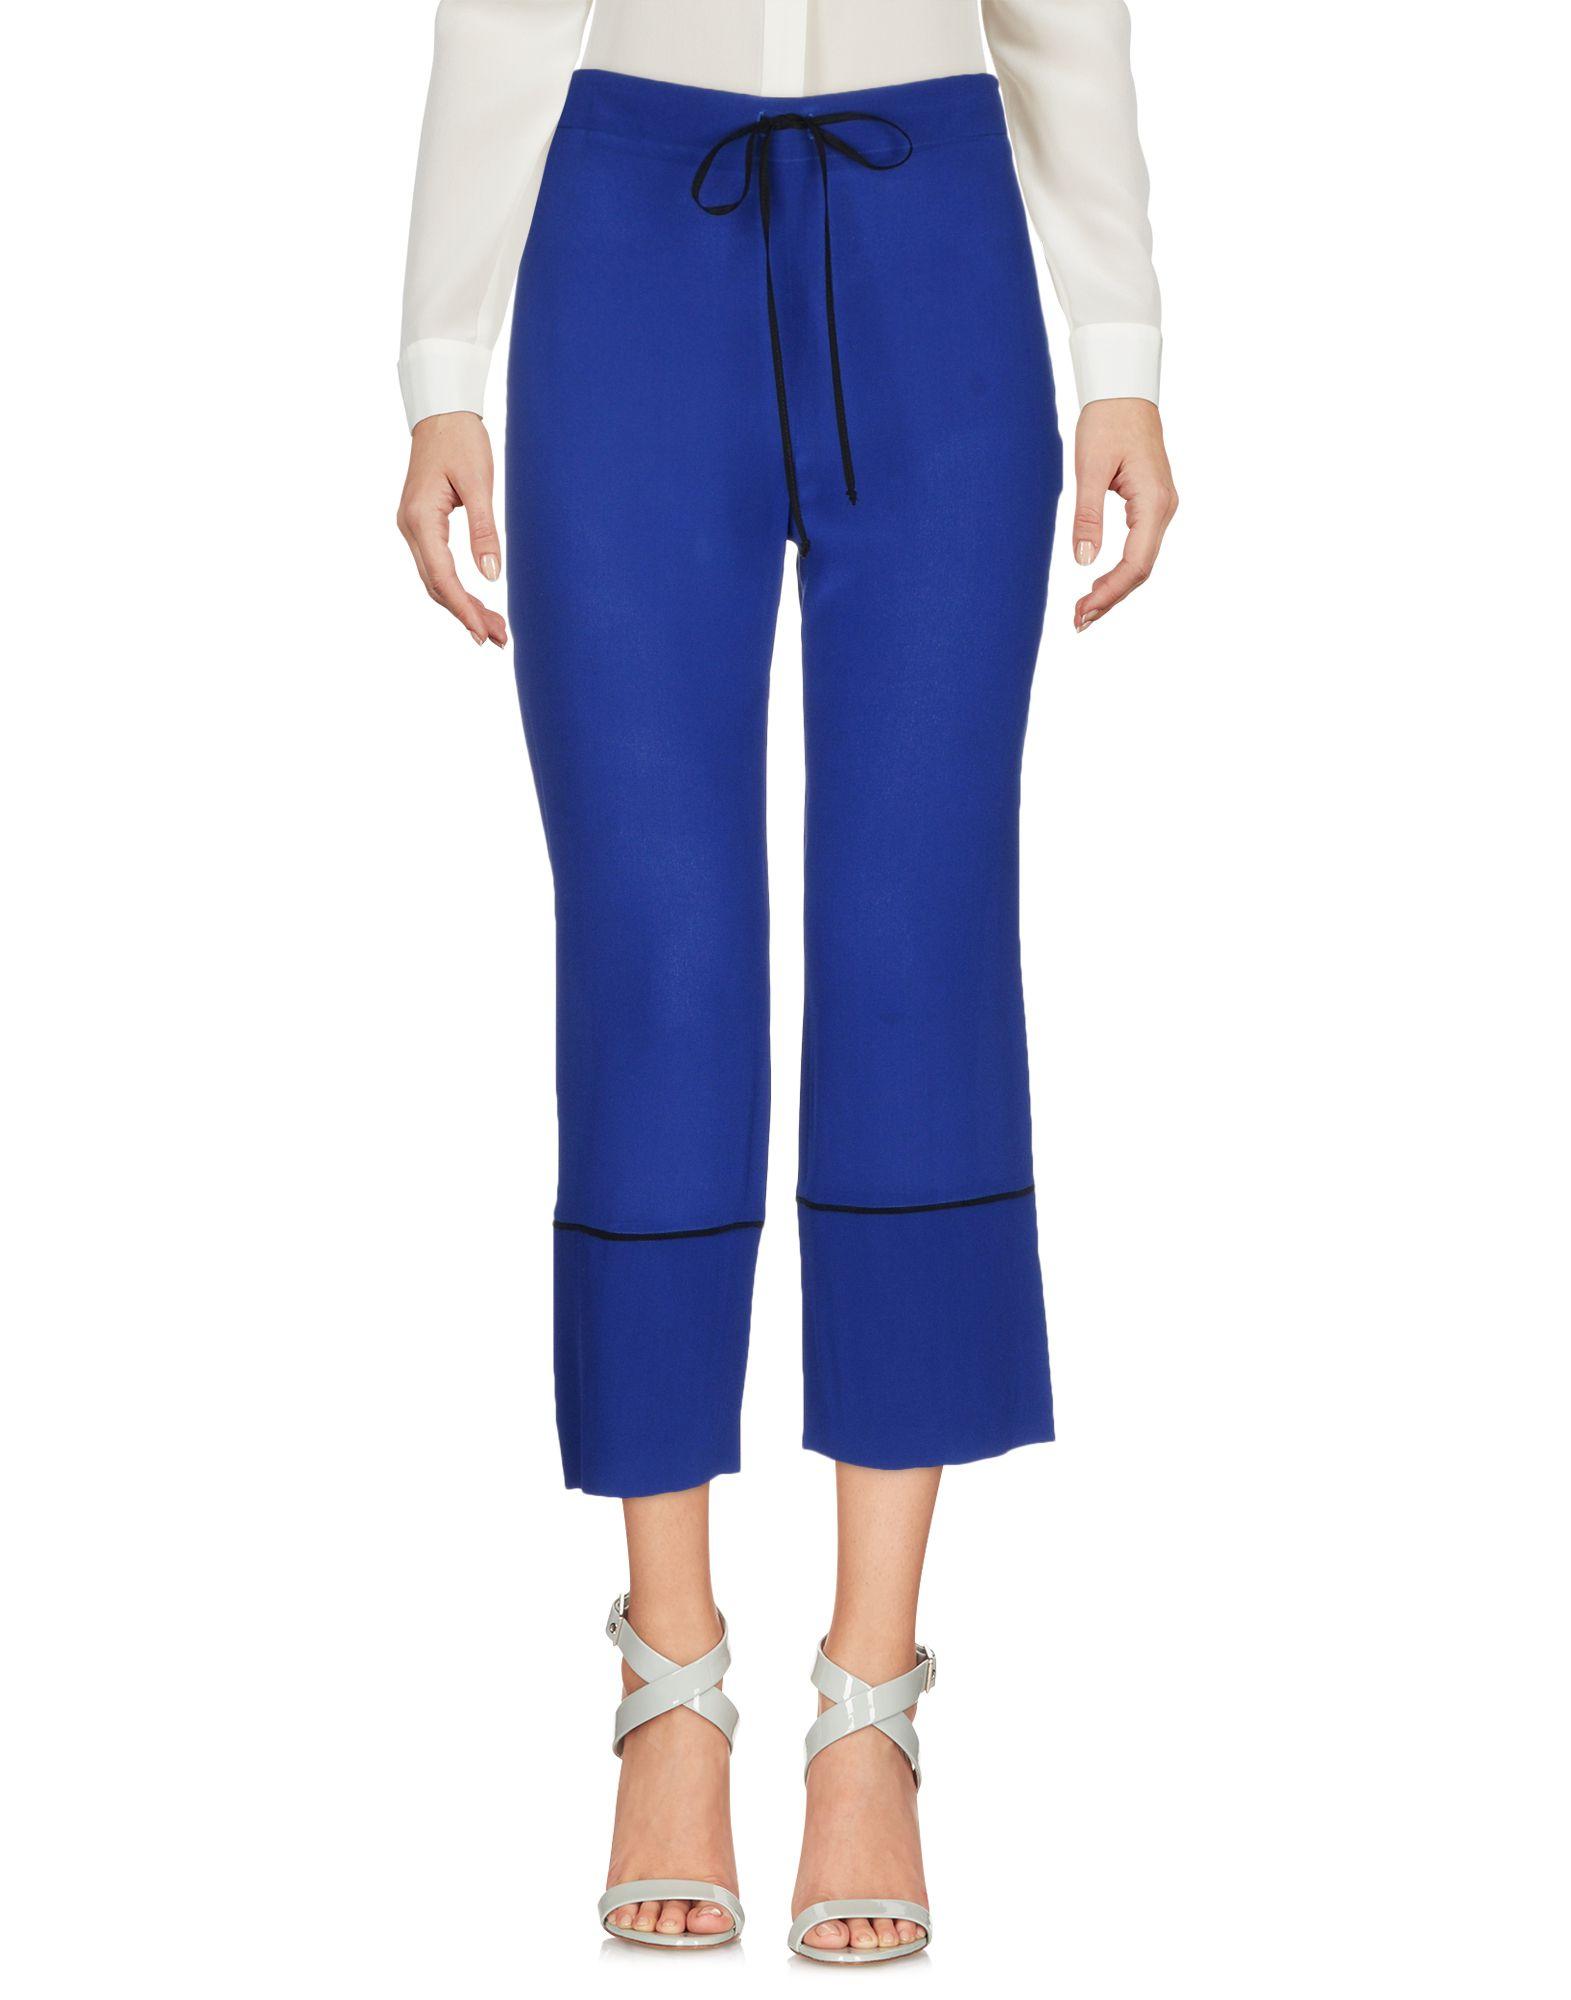 Pantalone Classico L' Autre Chose Donna - Acquista online su Q4V3dBPFP